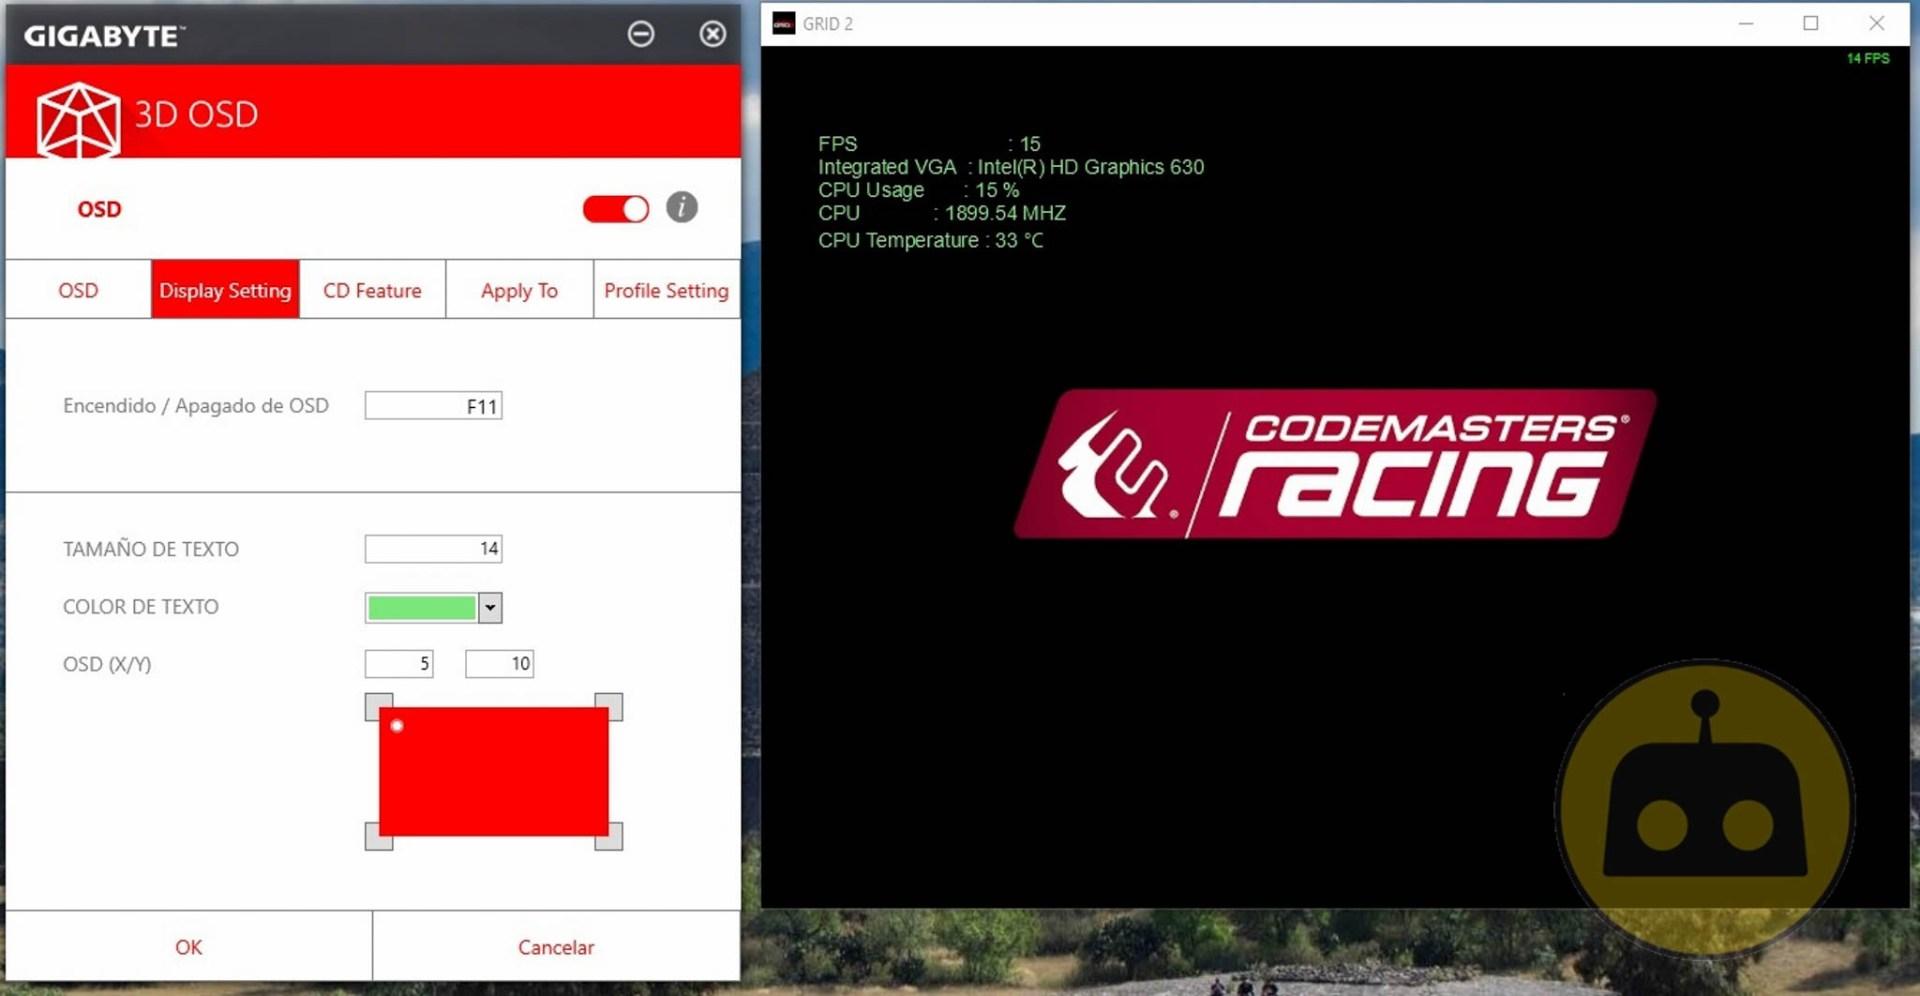 AORUS Z270X-GAMING 5 Motherboard, review